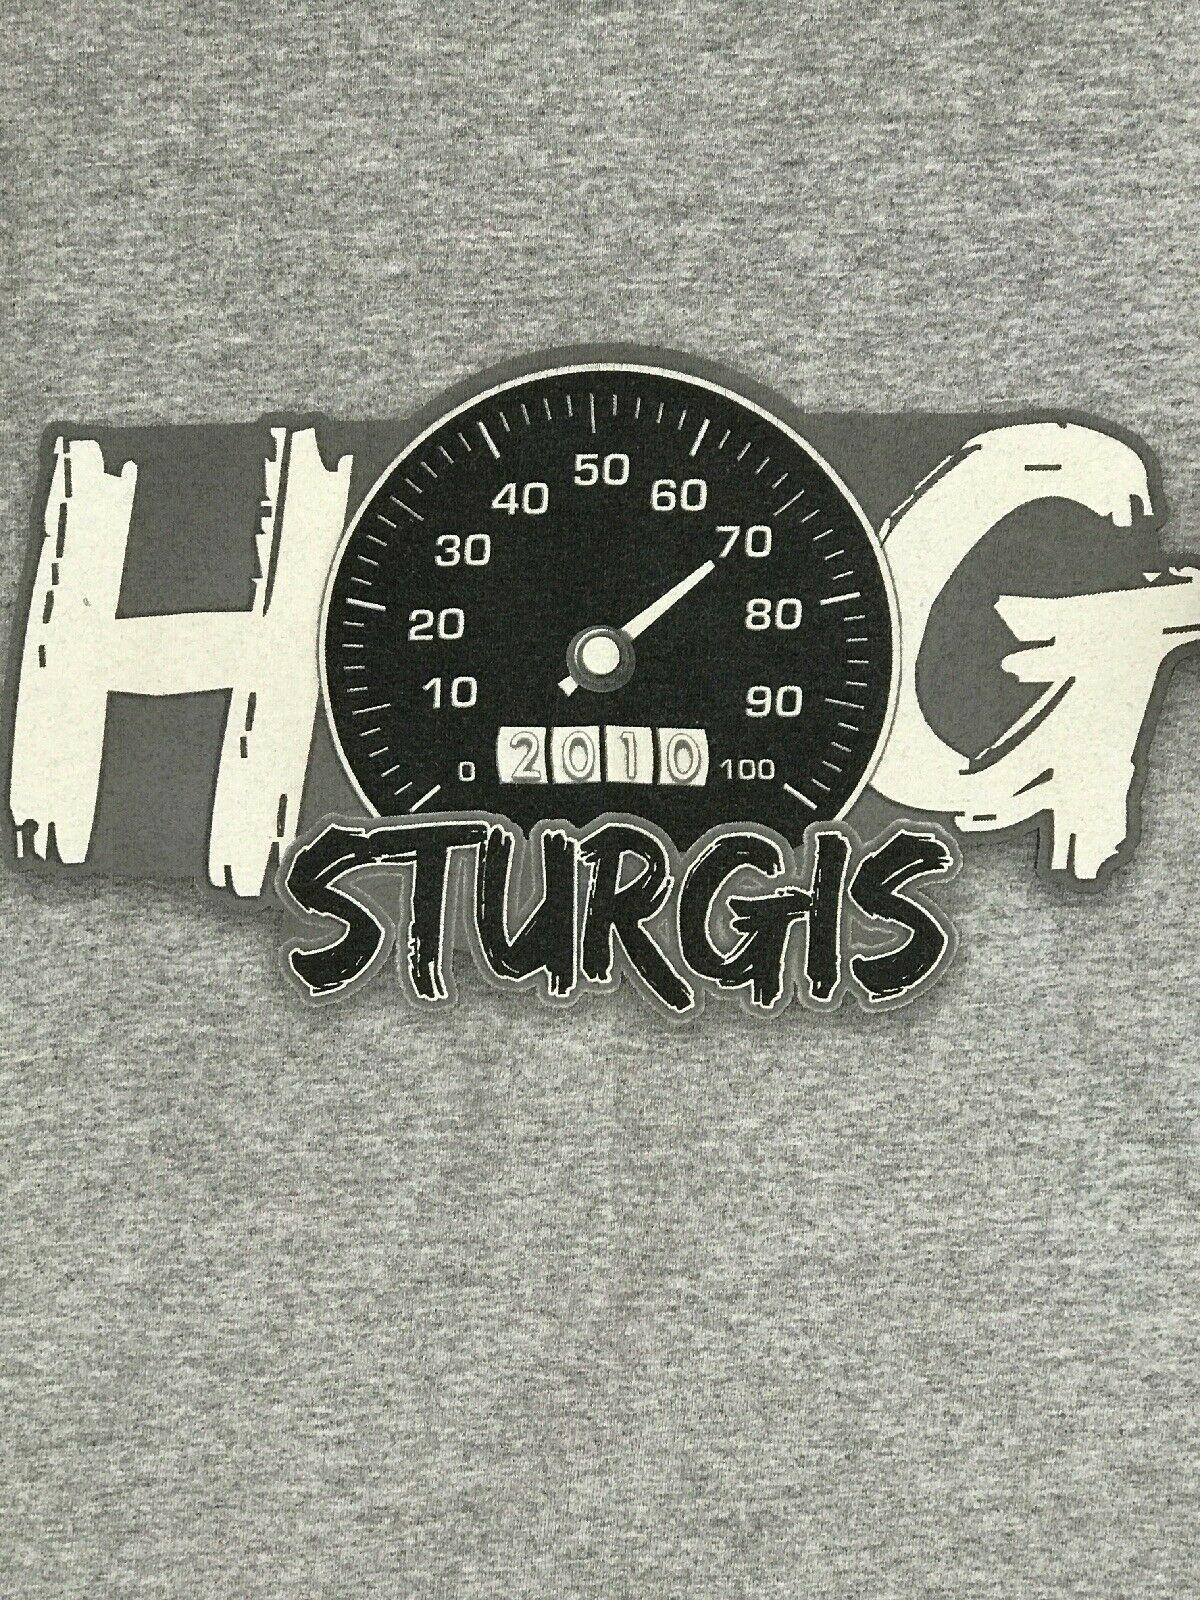 XL HOG Harley Owners Group Davidson Gray T Shirt 2010 Sturgis image 7